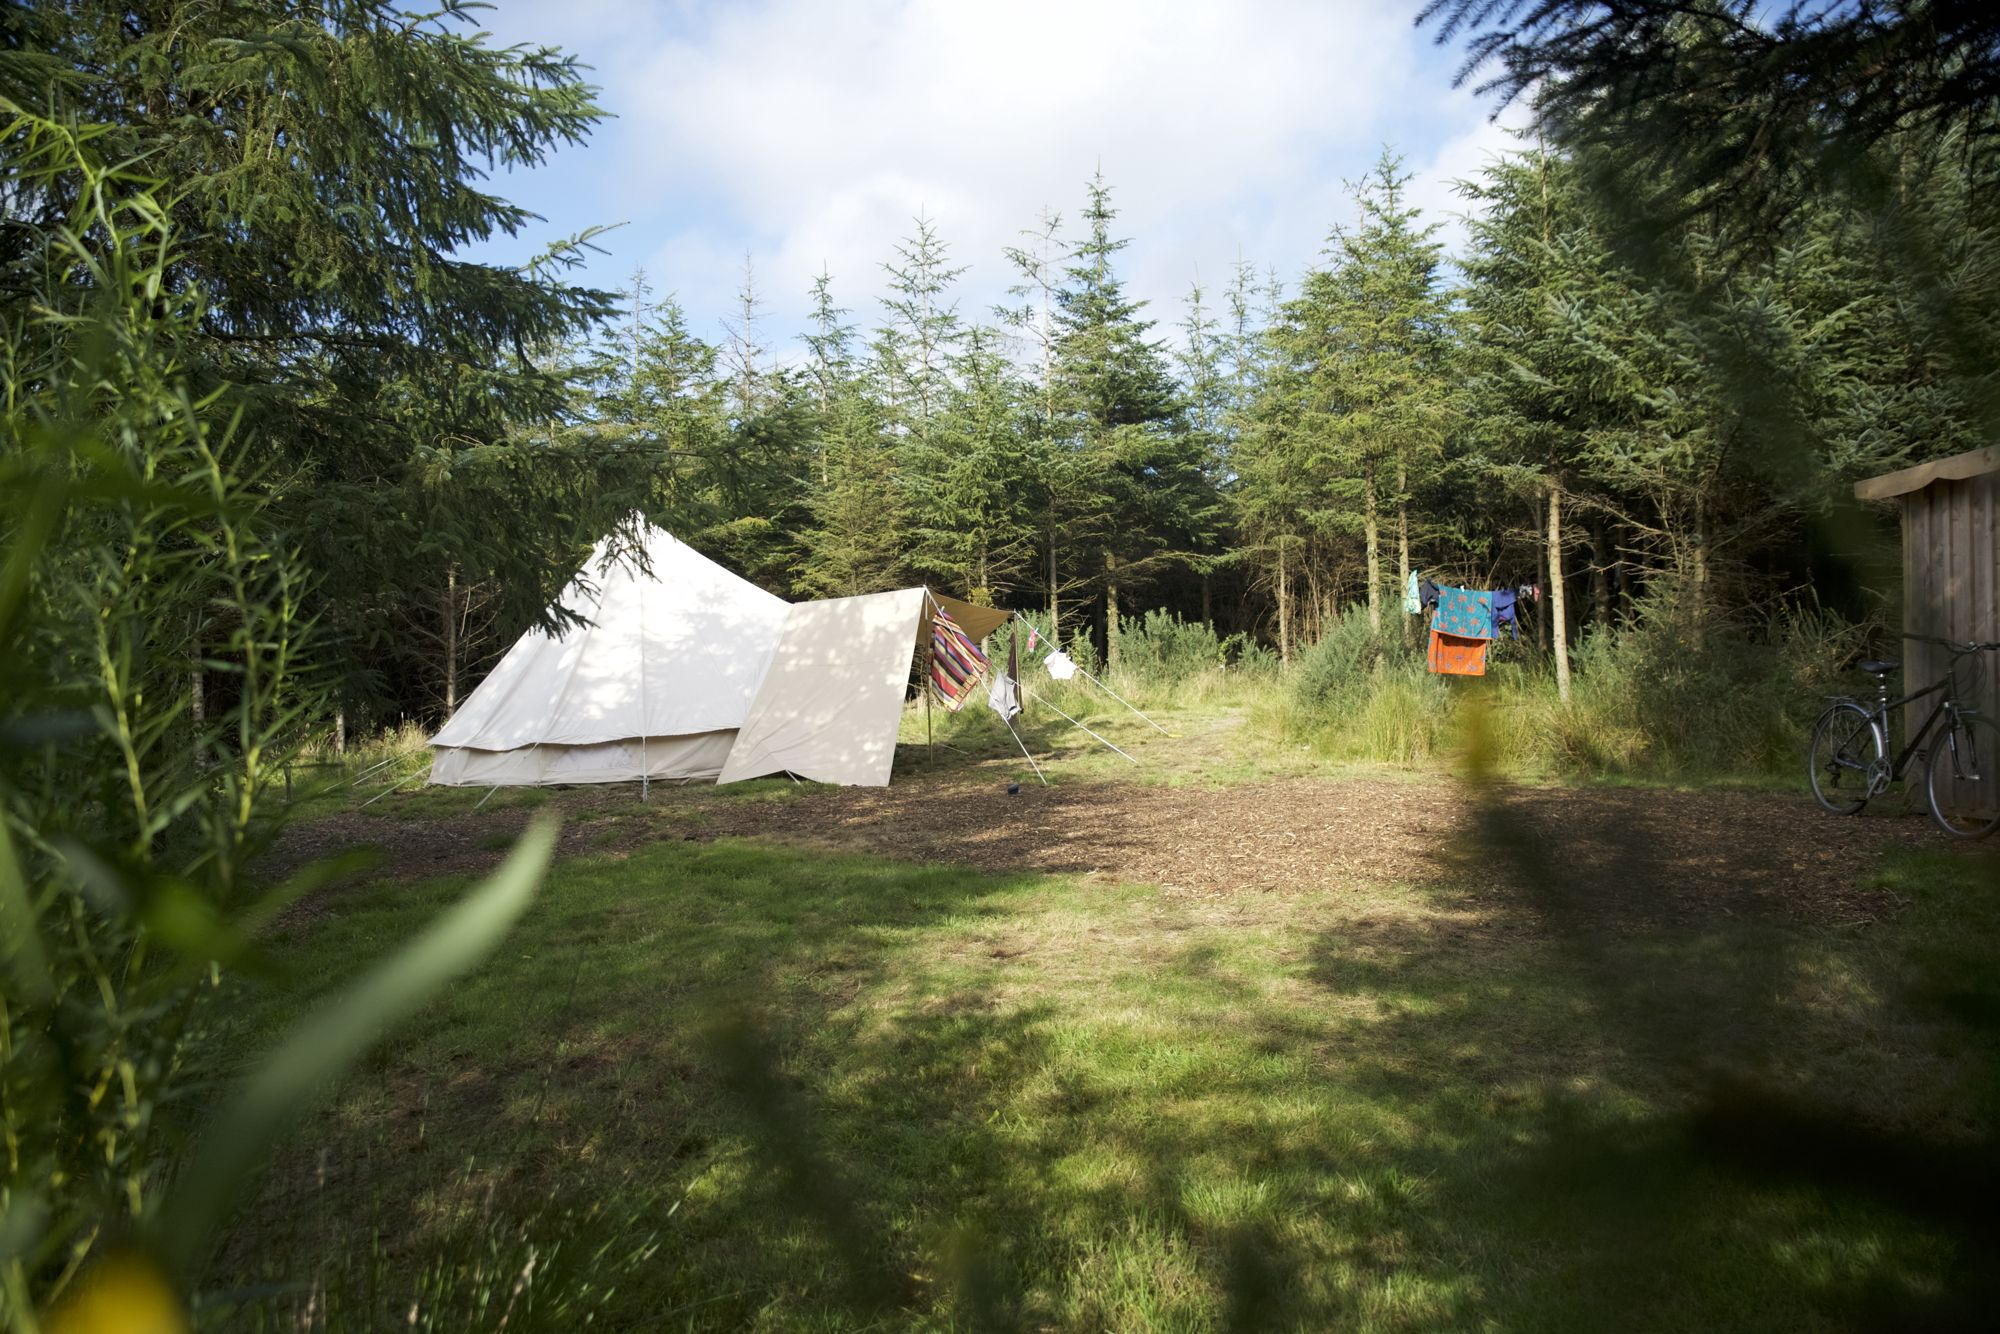 Pop-Up Campsites For Summer 2018